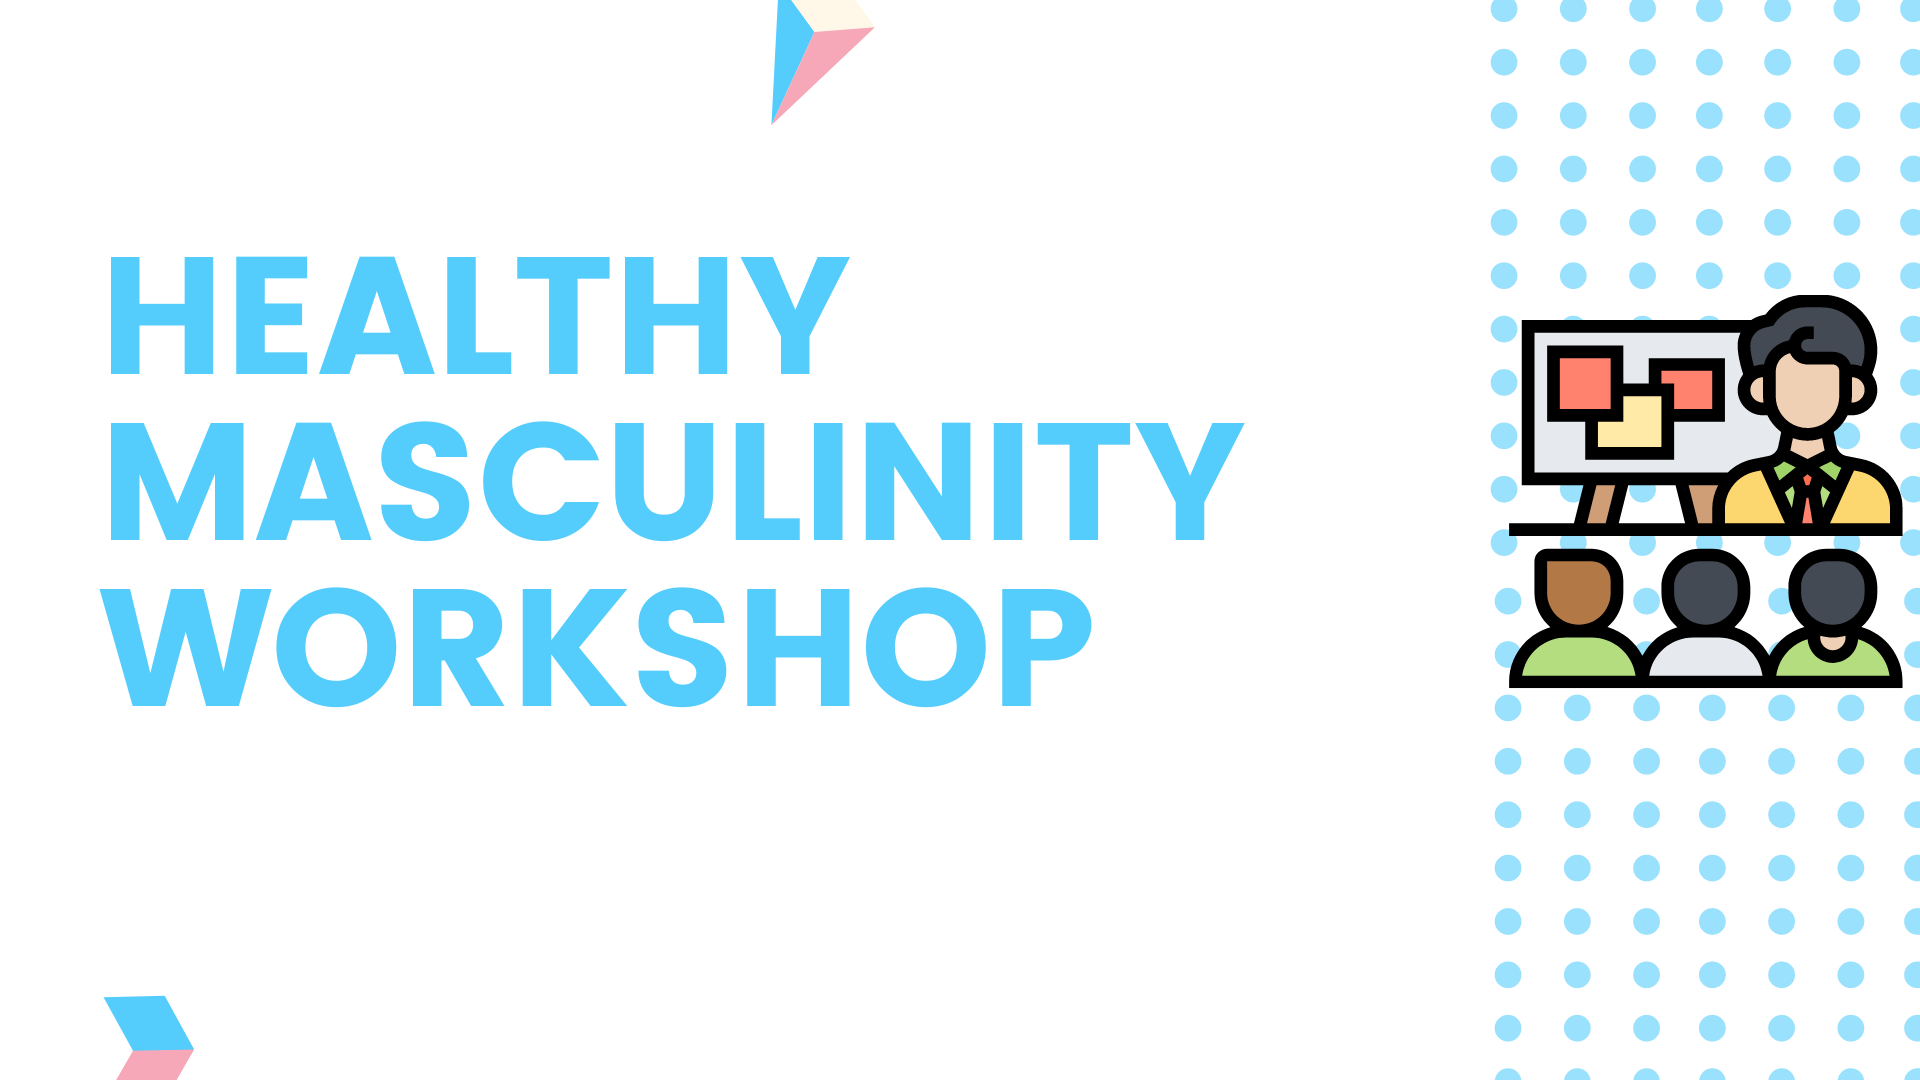 Healthy Masculinity Workshop